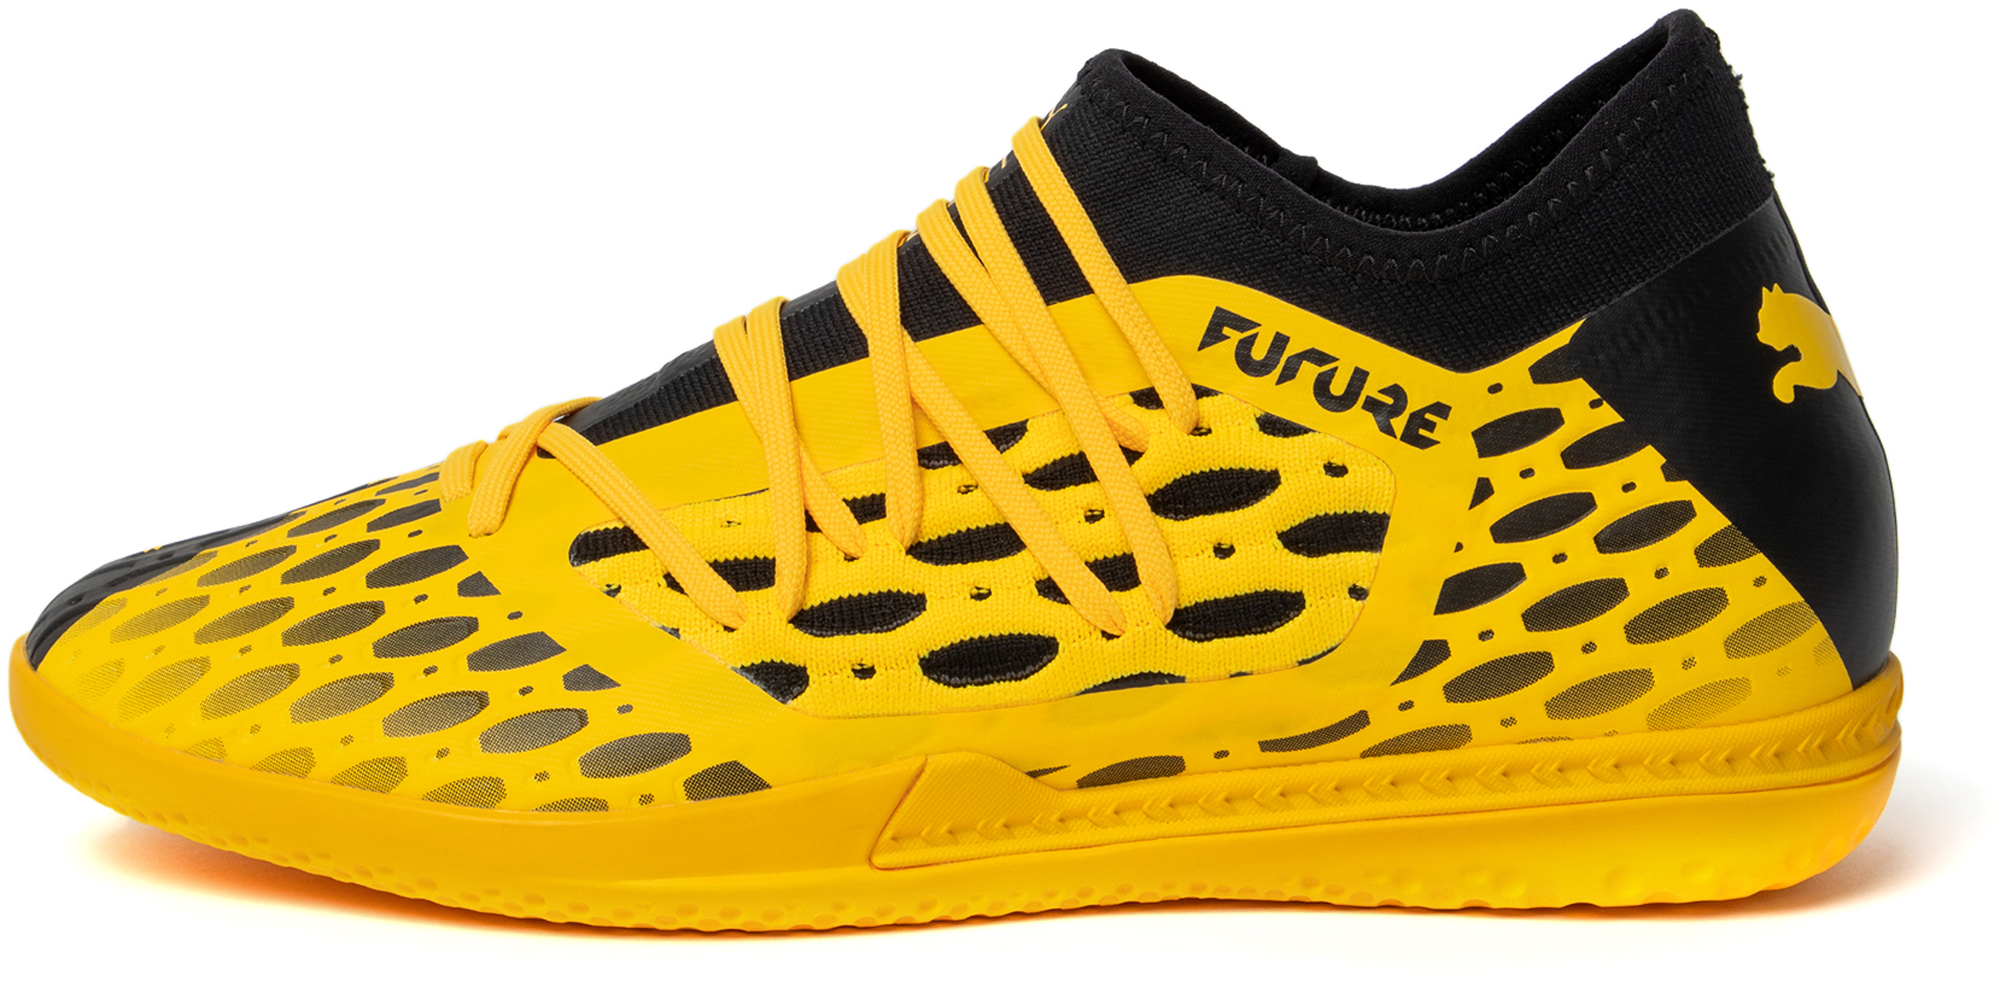 Puma Бутсы мужские Puma Future 5.3 Netfit, размер 40 puma pace 5 short